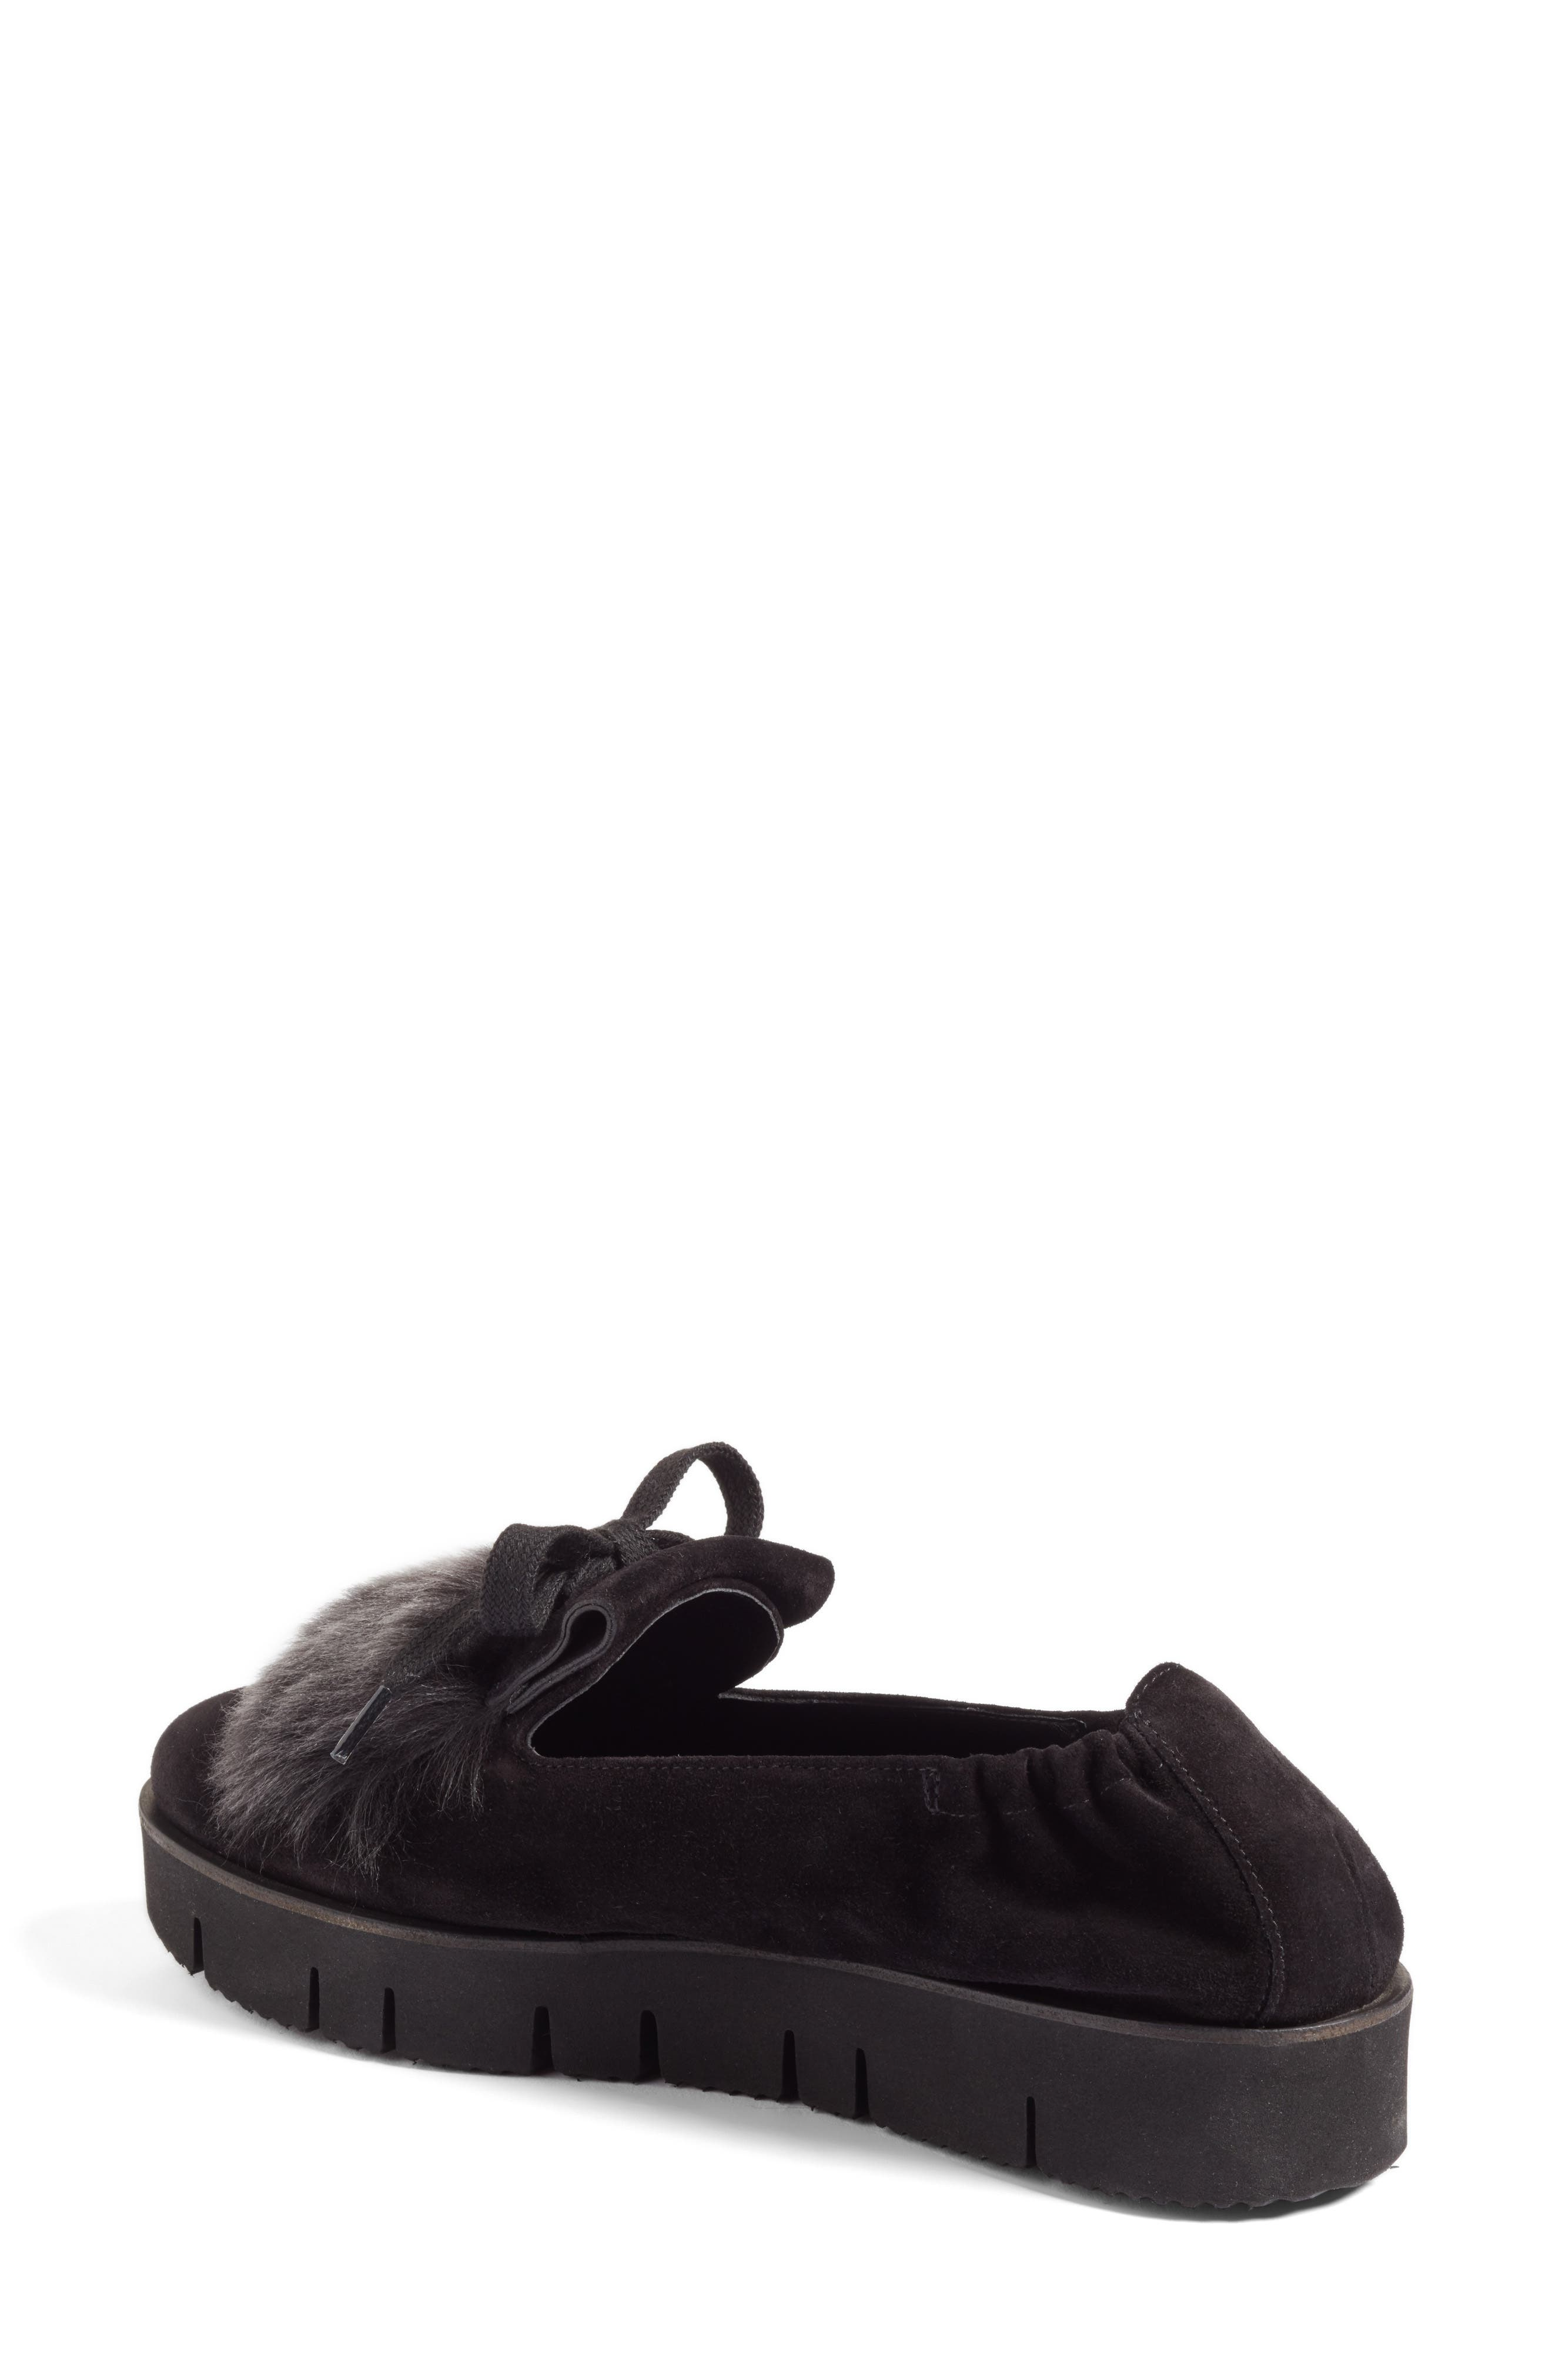 Kennel & Schmenger Malu Suede & Genuine Shearling Slip-On Sneaker,                             Alternate thumbnail 2, color,                             Black